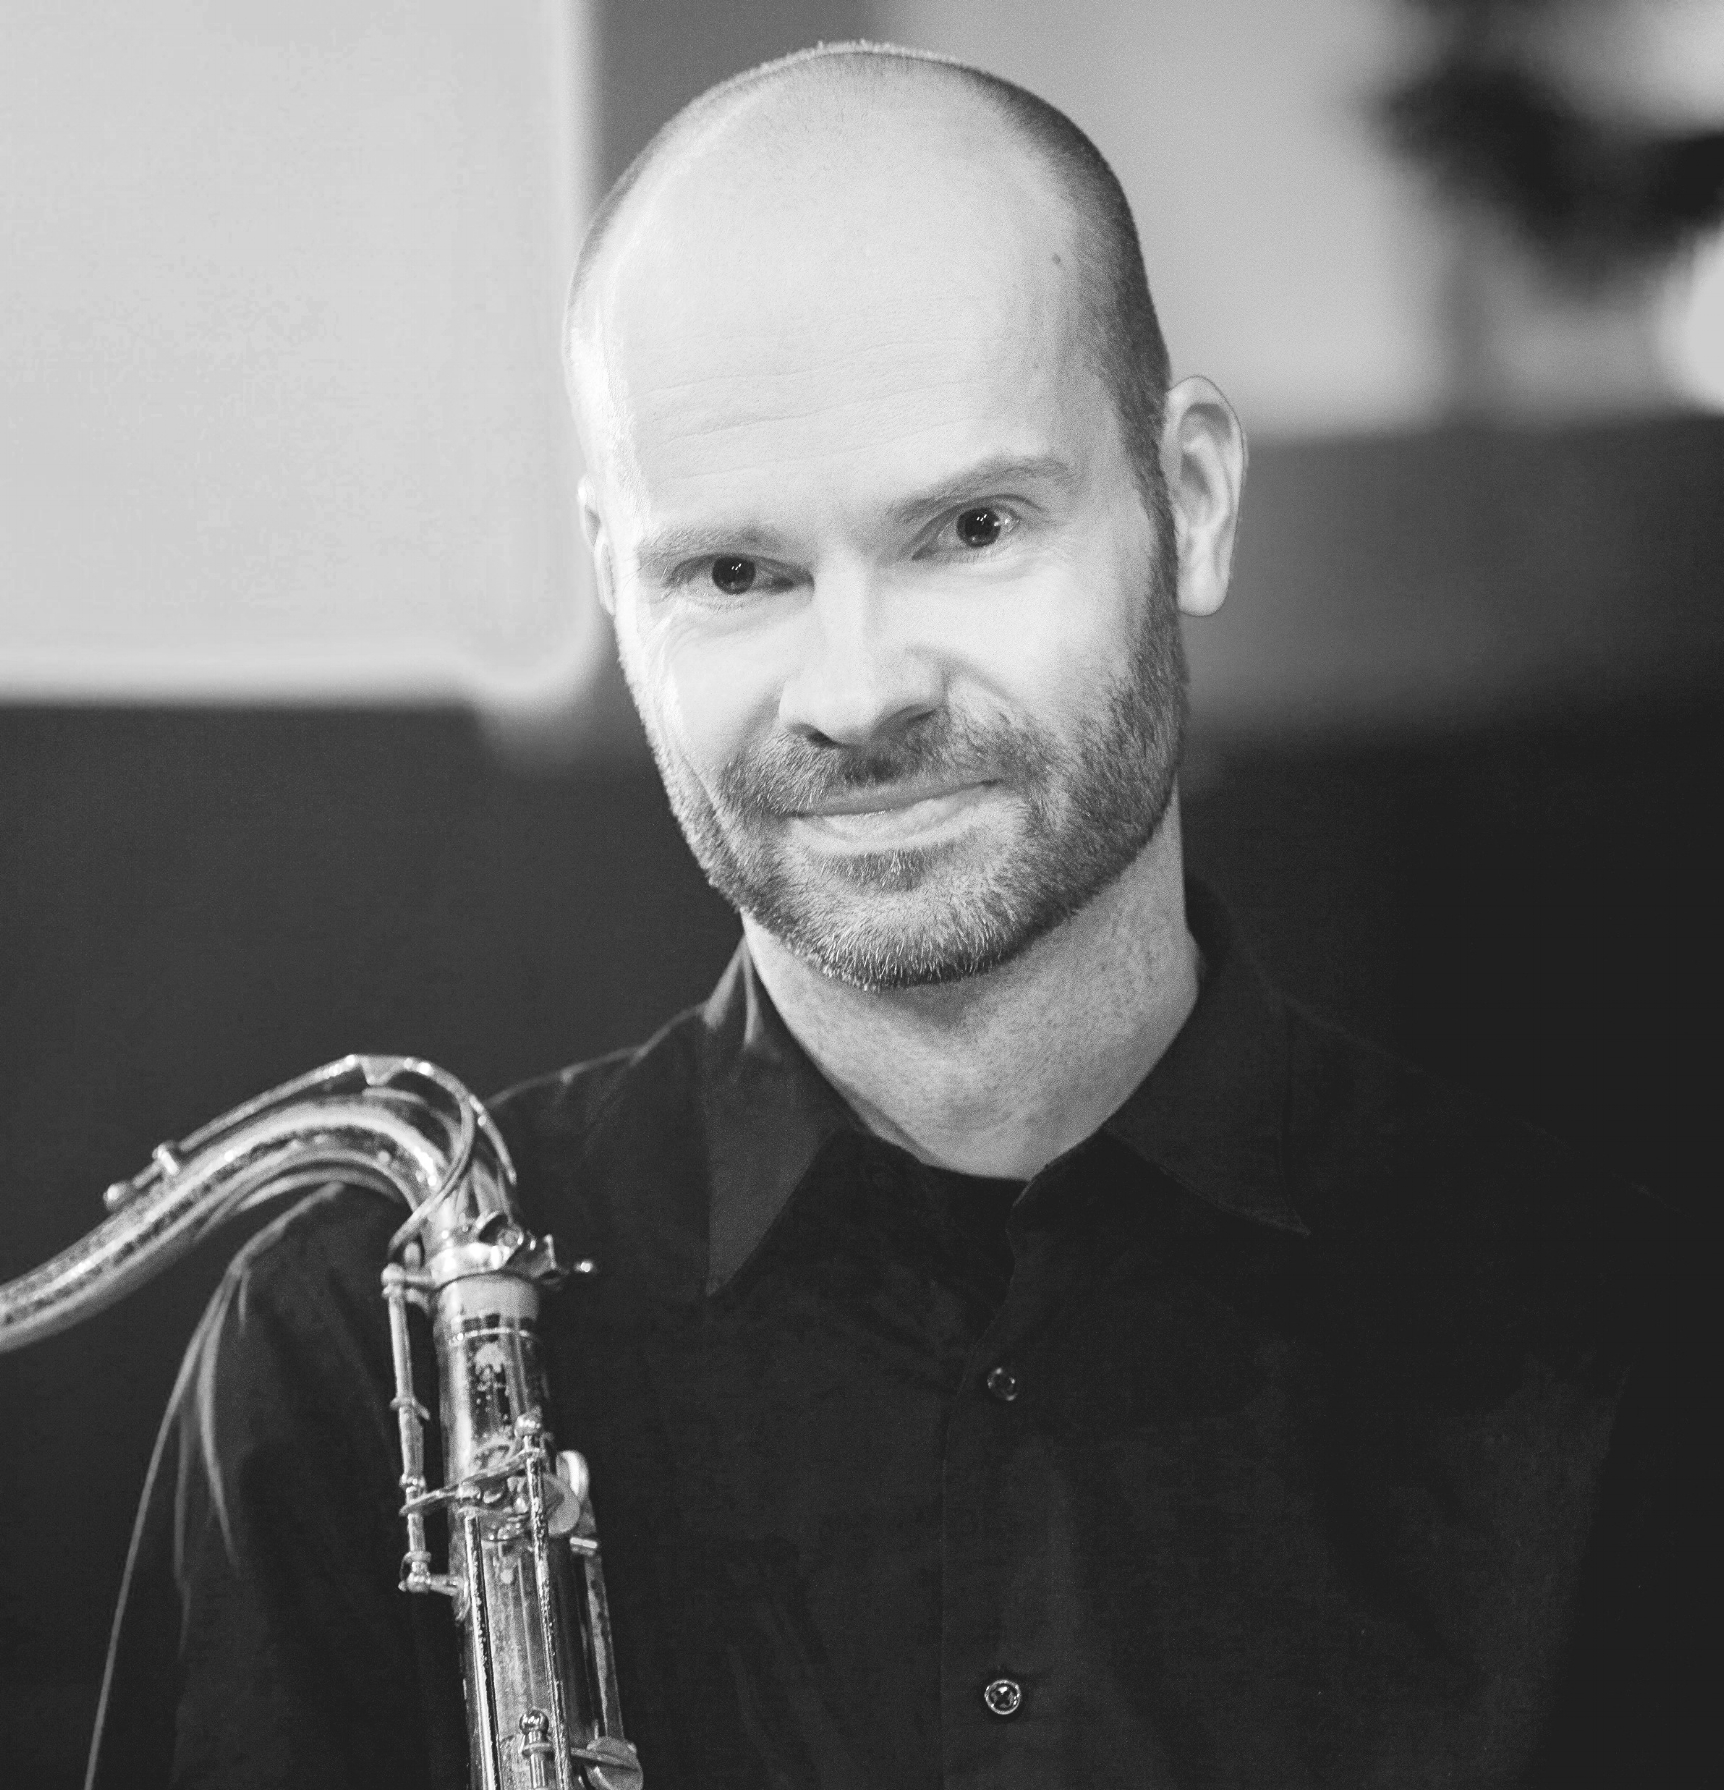 Joonatan Rautio, saxophone